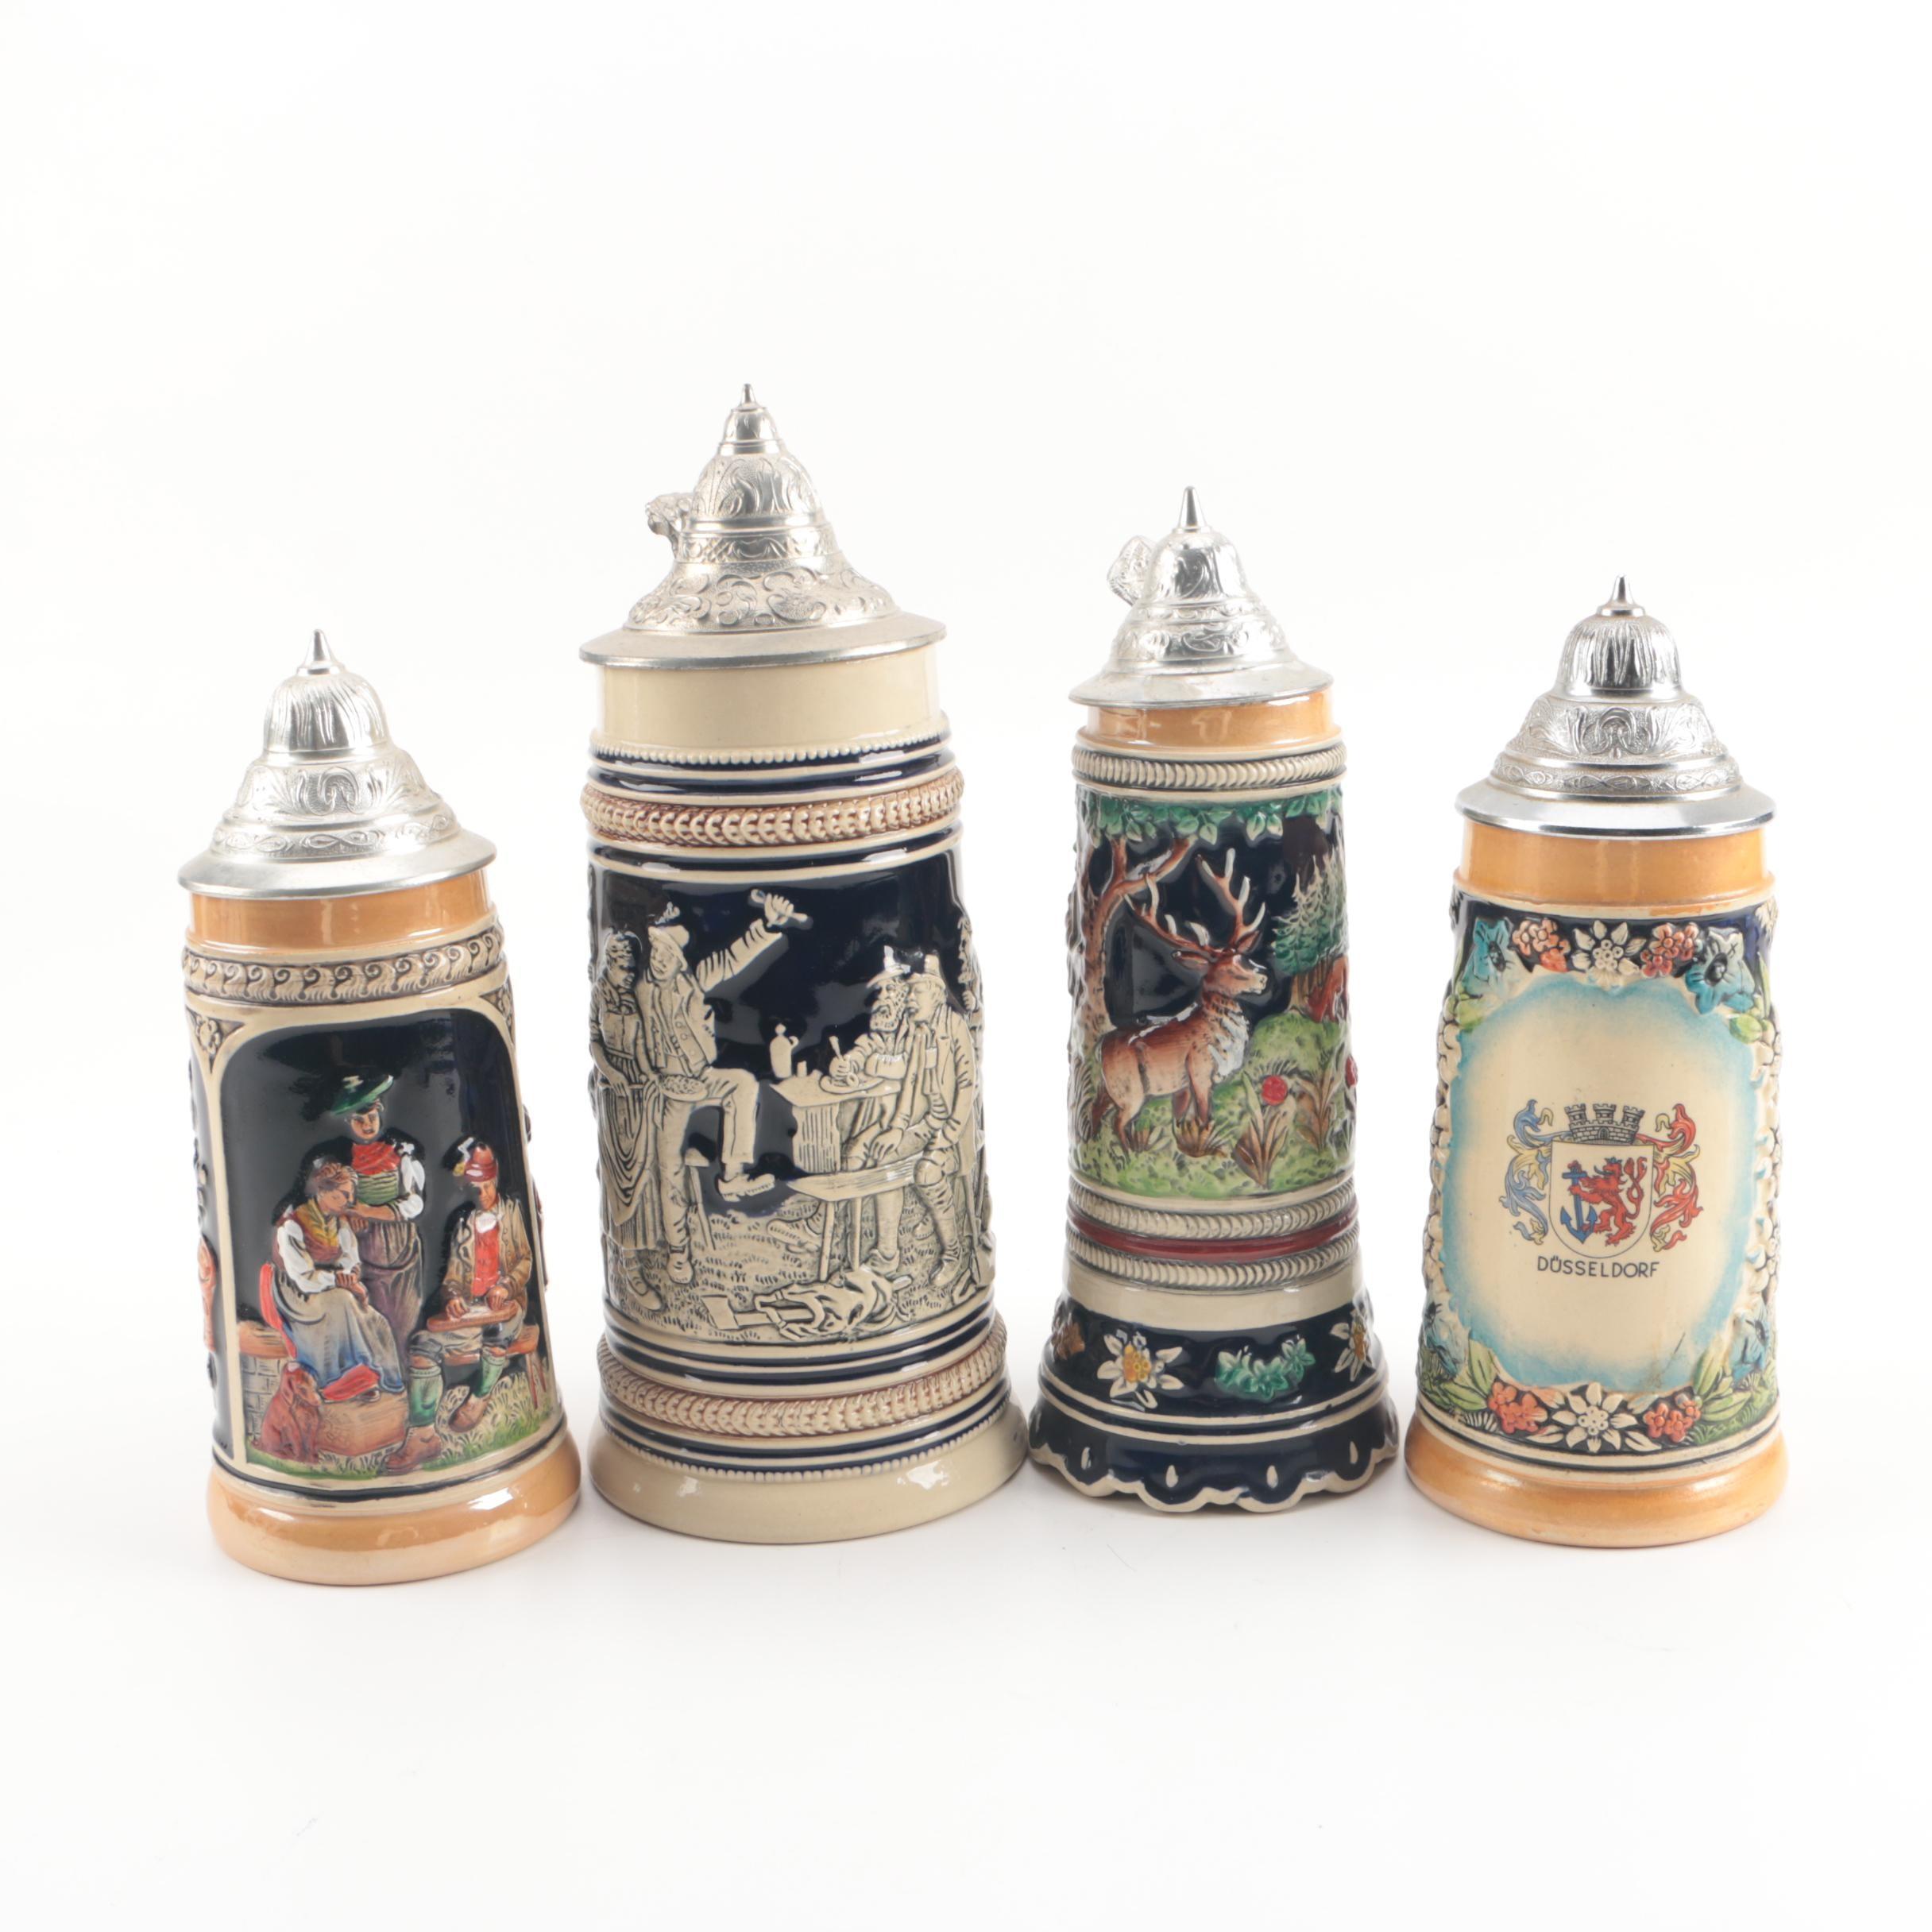 Vintage German Ceramic Beer Steins Featuring Marzi and Remy